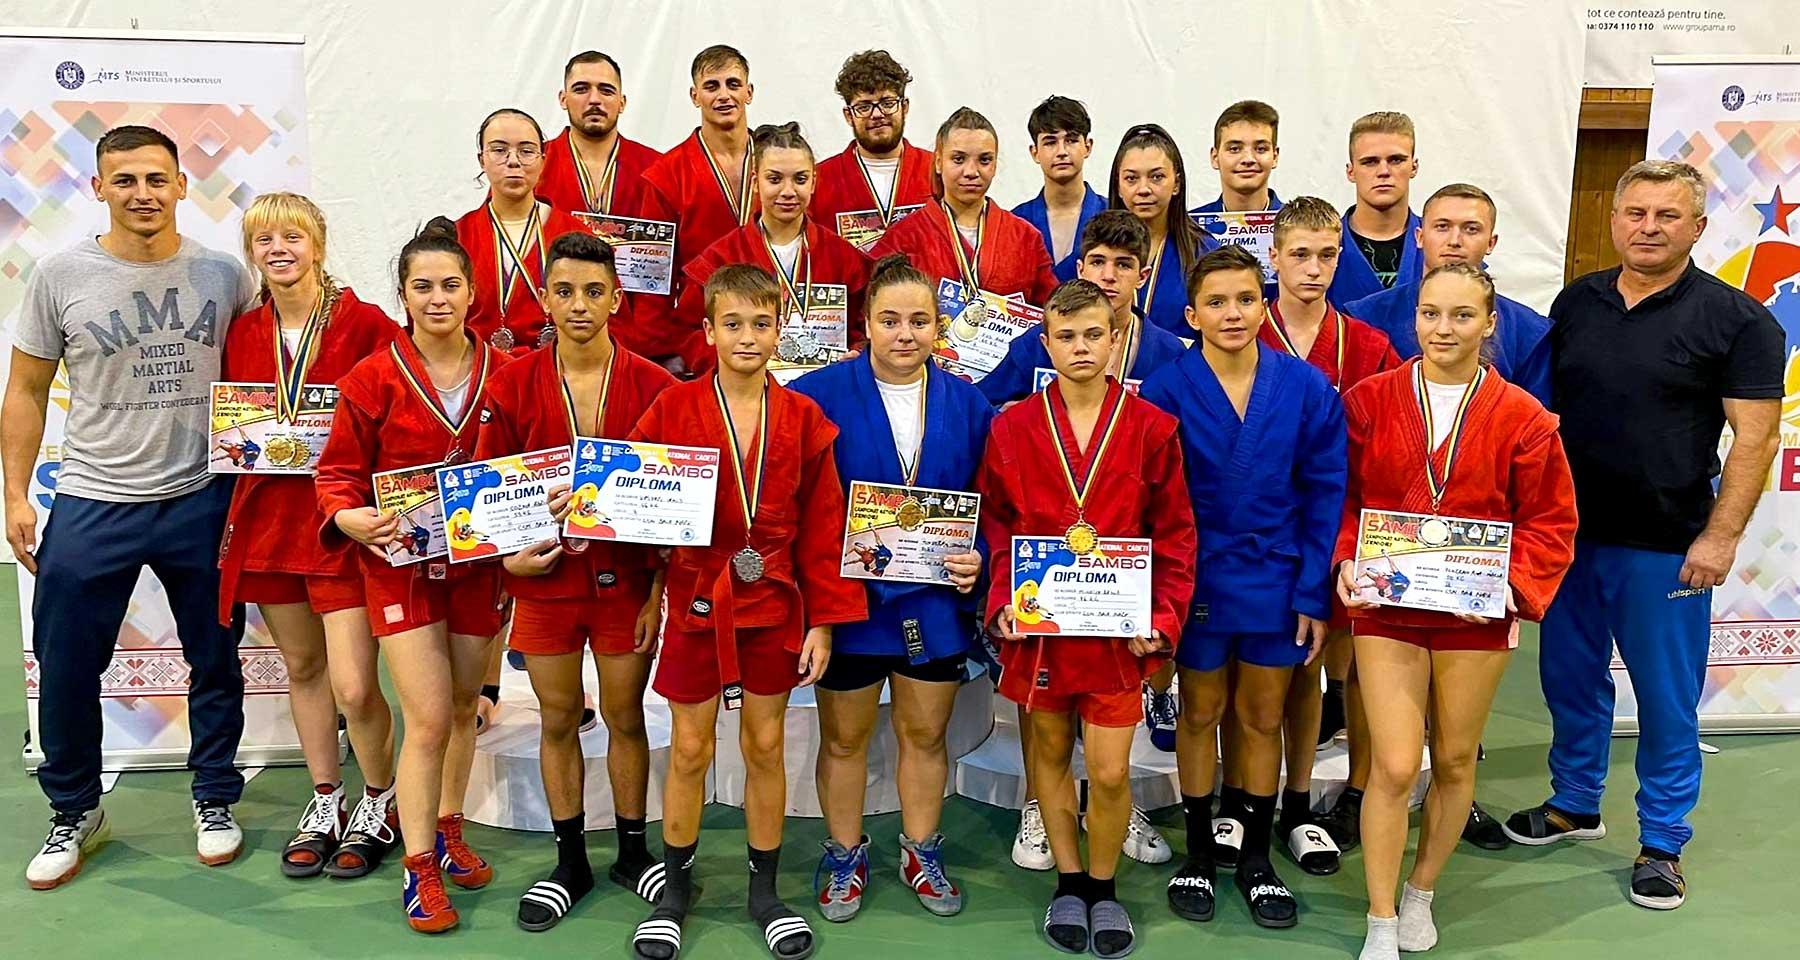 Sambo: CSM Baia Mare, 23 de medalii la C.N. Cadeți și Seniori